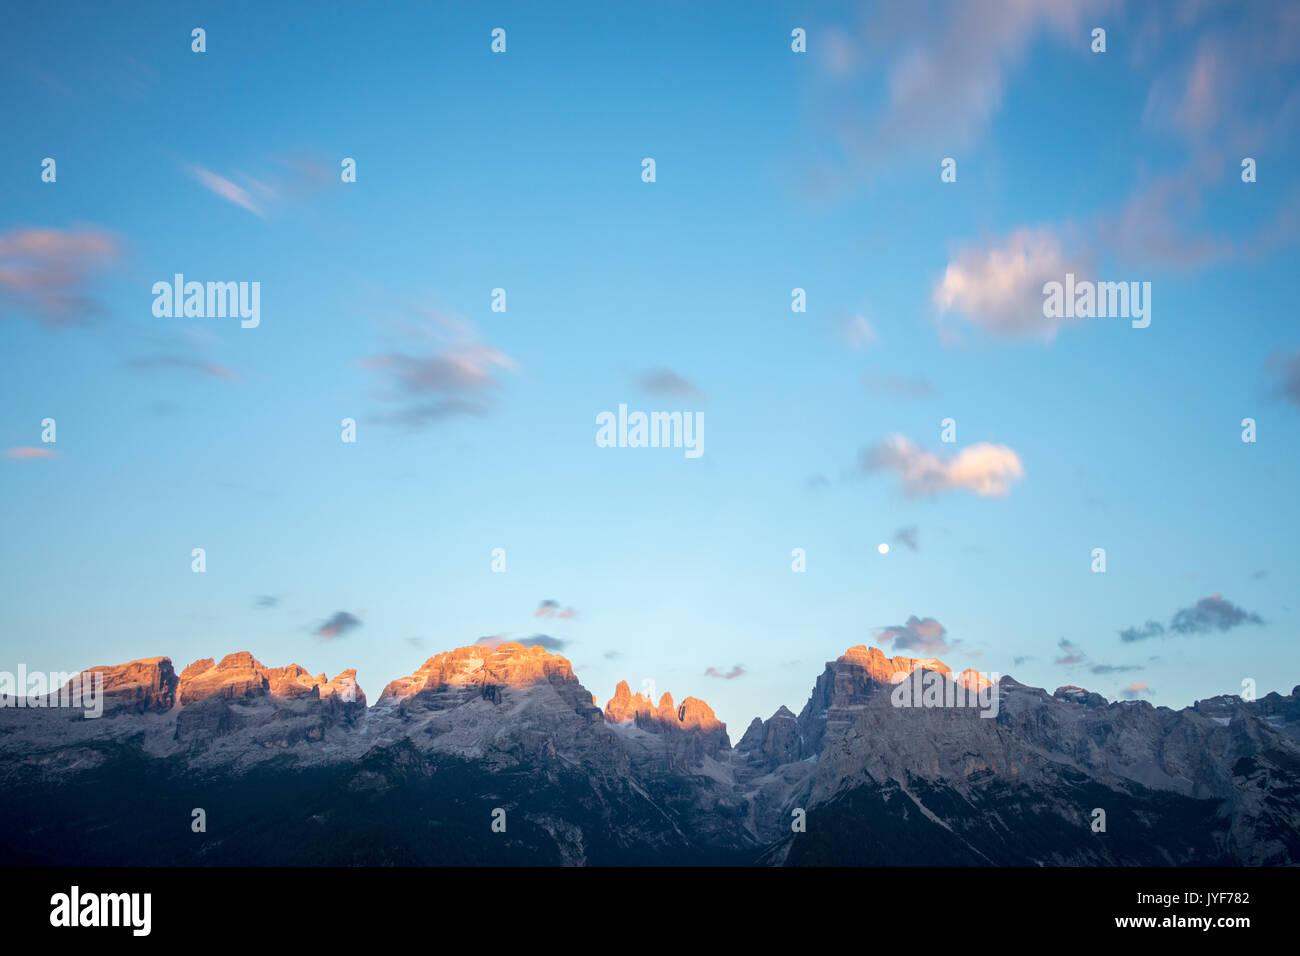 Sunset on the rocky peaks seen from Malga Ritorto Madonna di Campiglio Brenta Dolomites Trentino Alto Adige Italy Europe - Stock Image